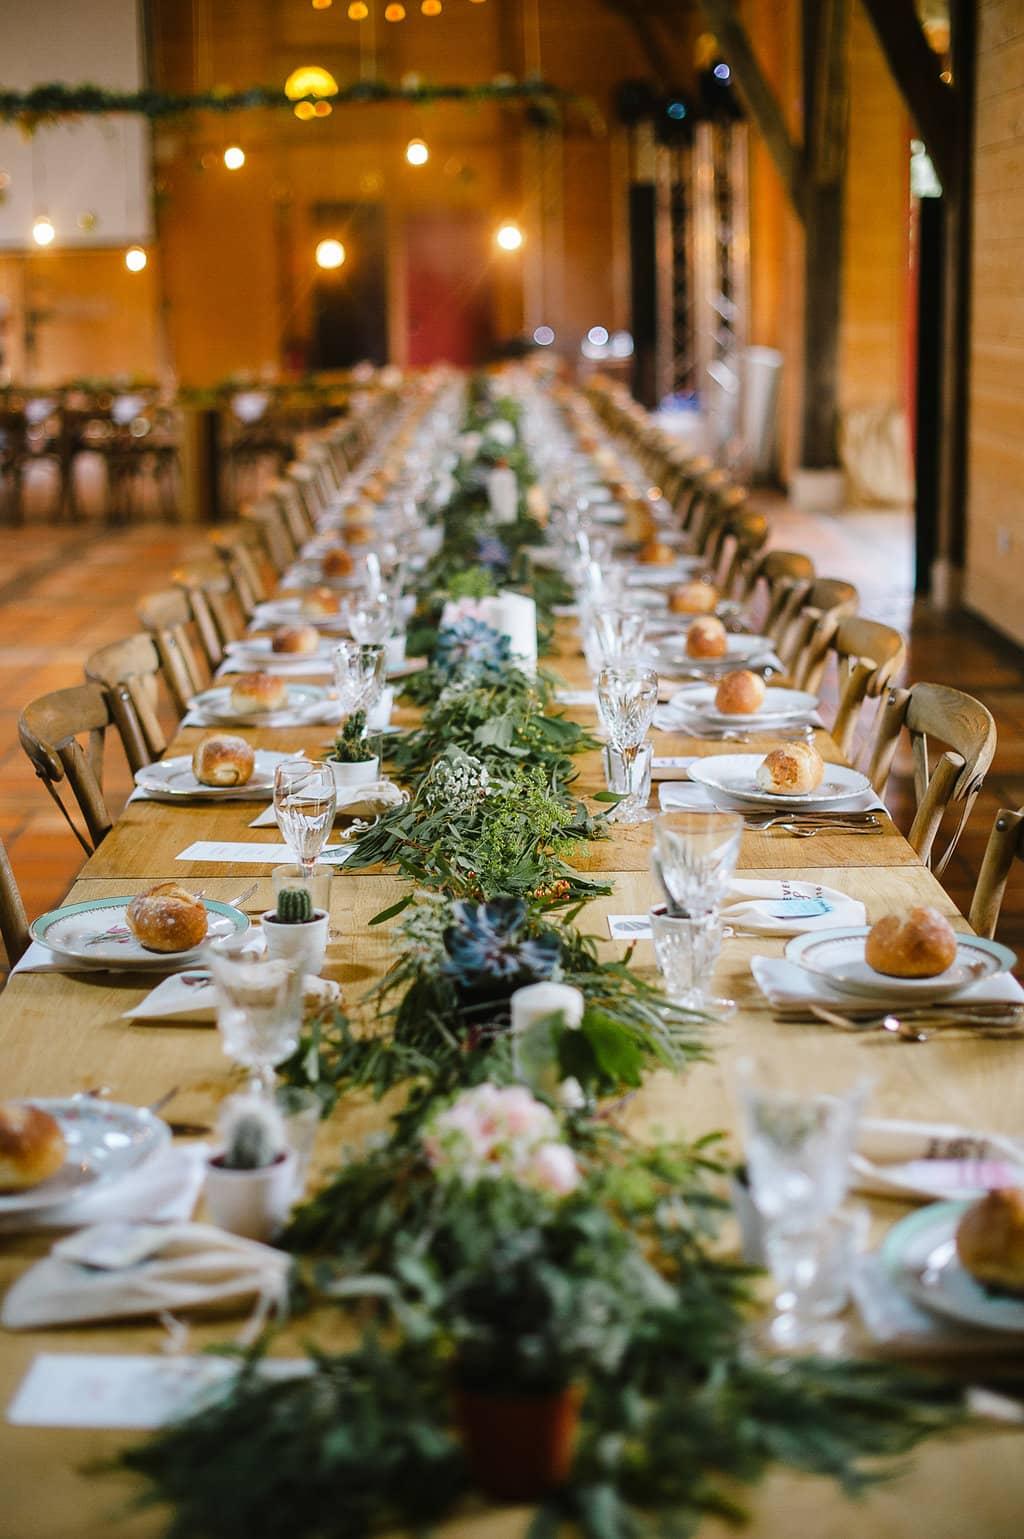 centre-table-chemin-vegetal-plante-grasse-mariage